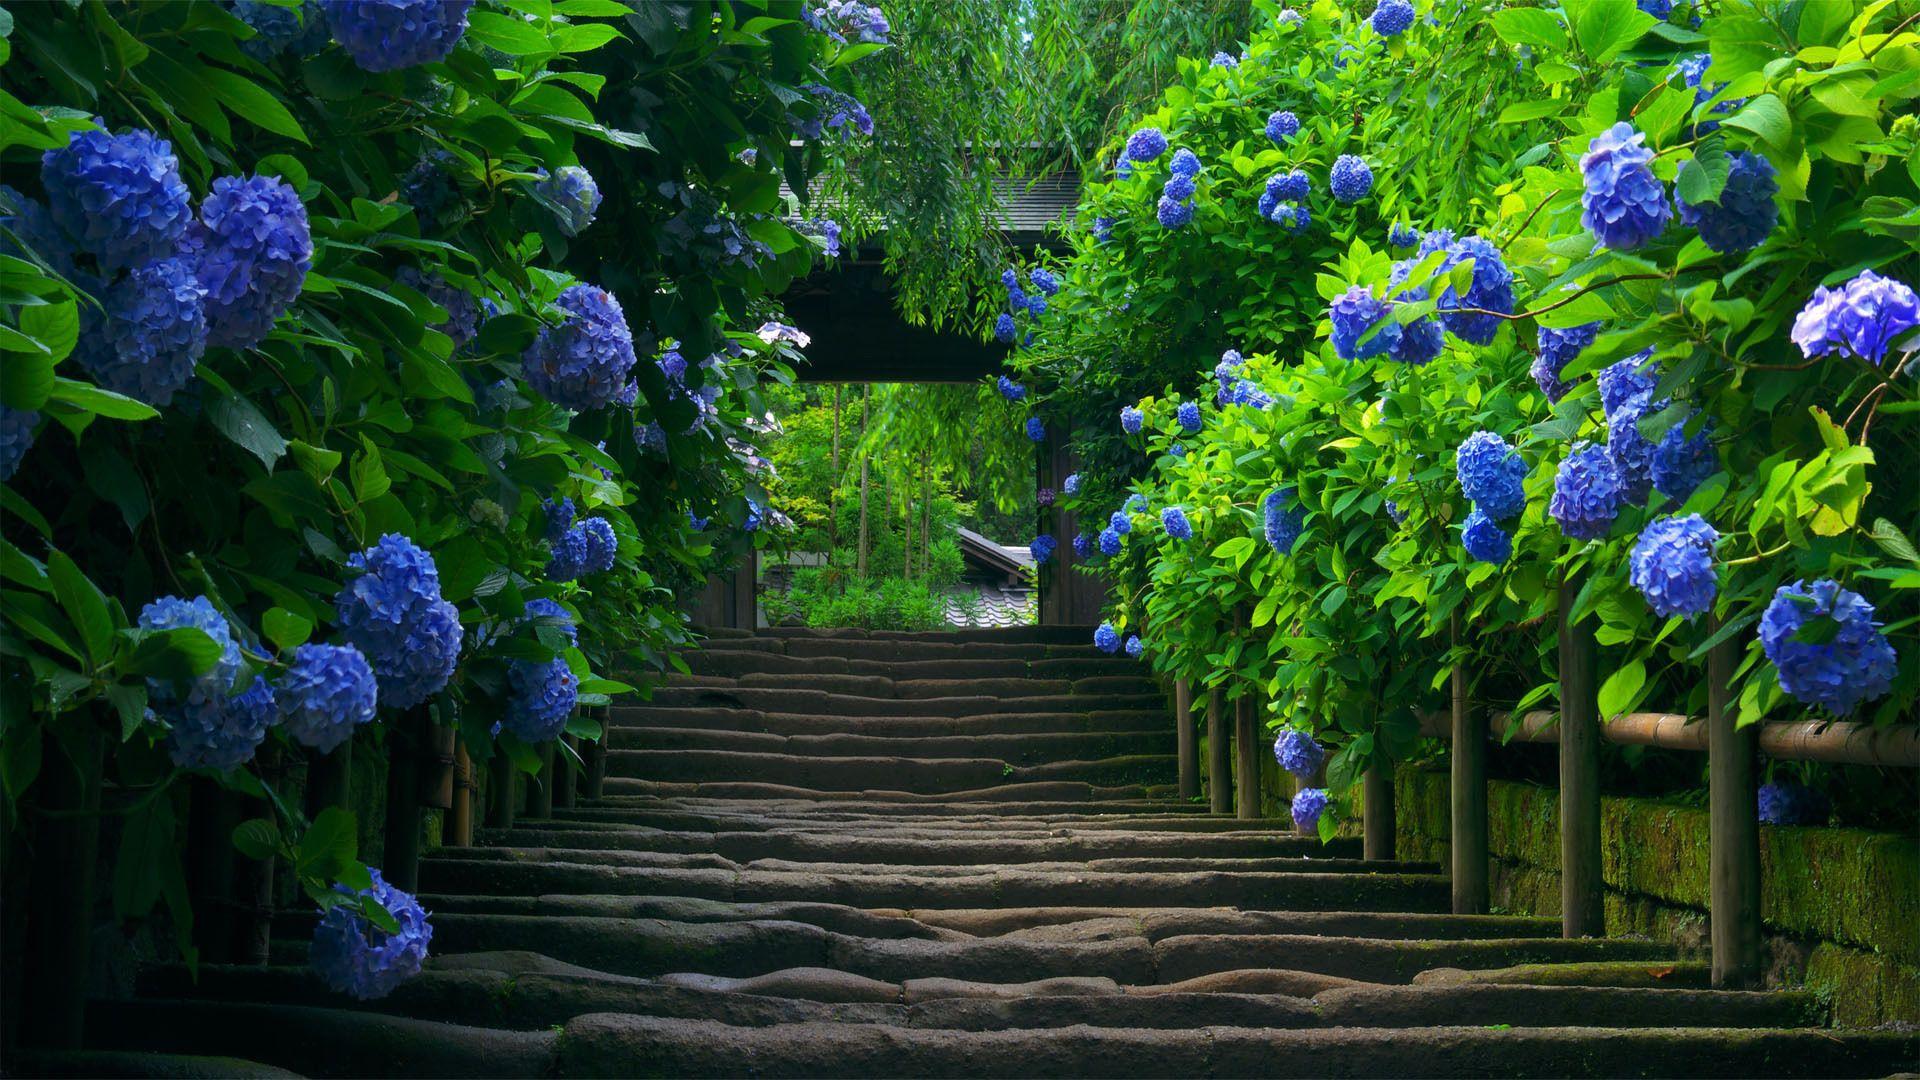 Japanese Garden S Inviting Walkway Hd Nature Wallpapers Flower Desktop Wallpaper Beautiful Hydrangeas Garden flower wallpaper hd nature